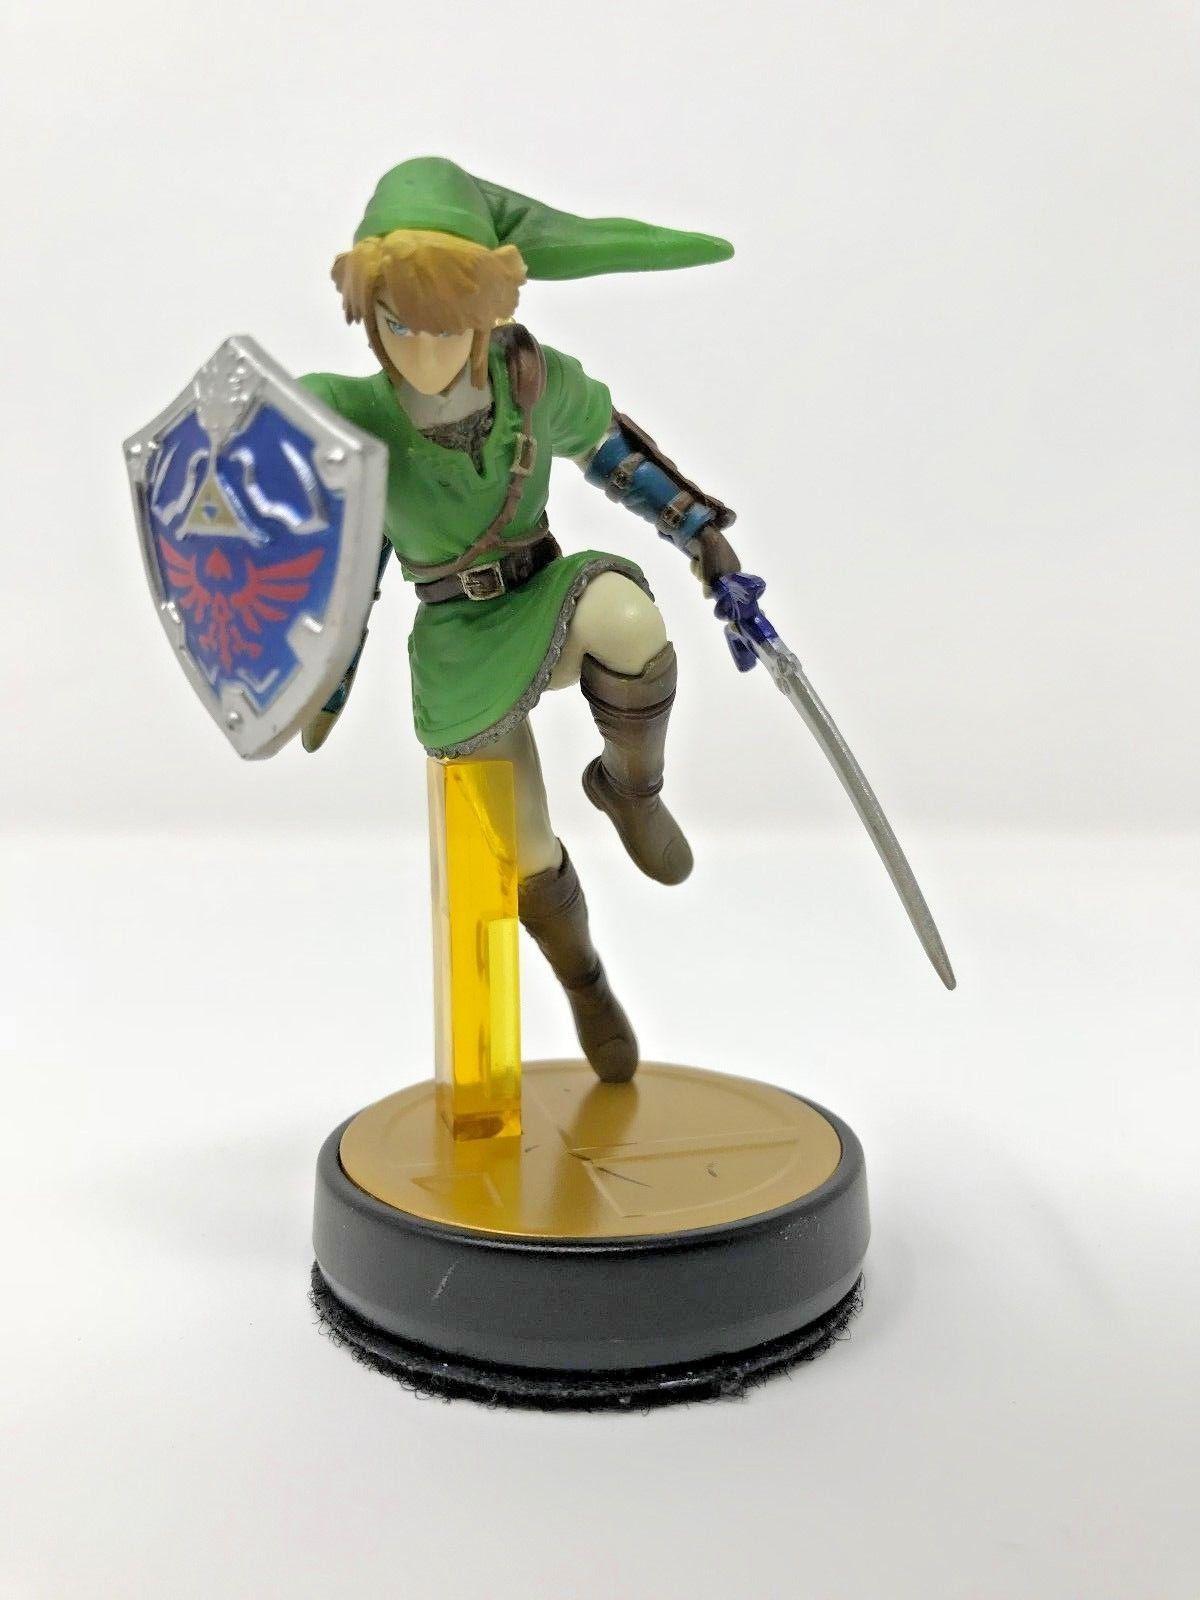 Details about Link Amiibo Super Smash Bros Series Zelda